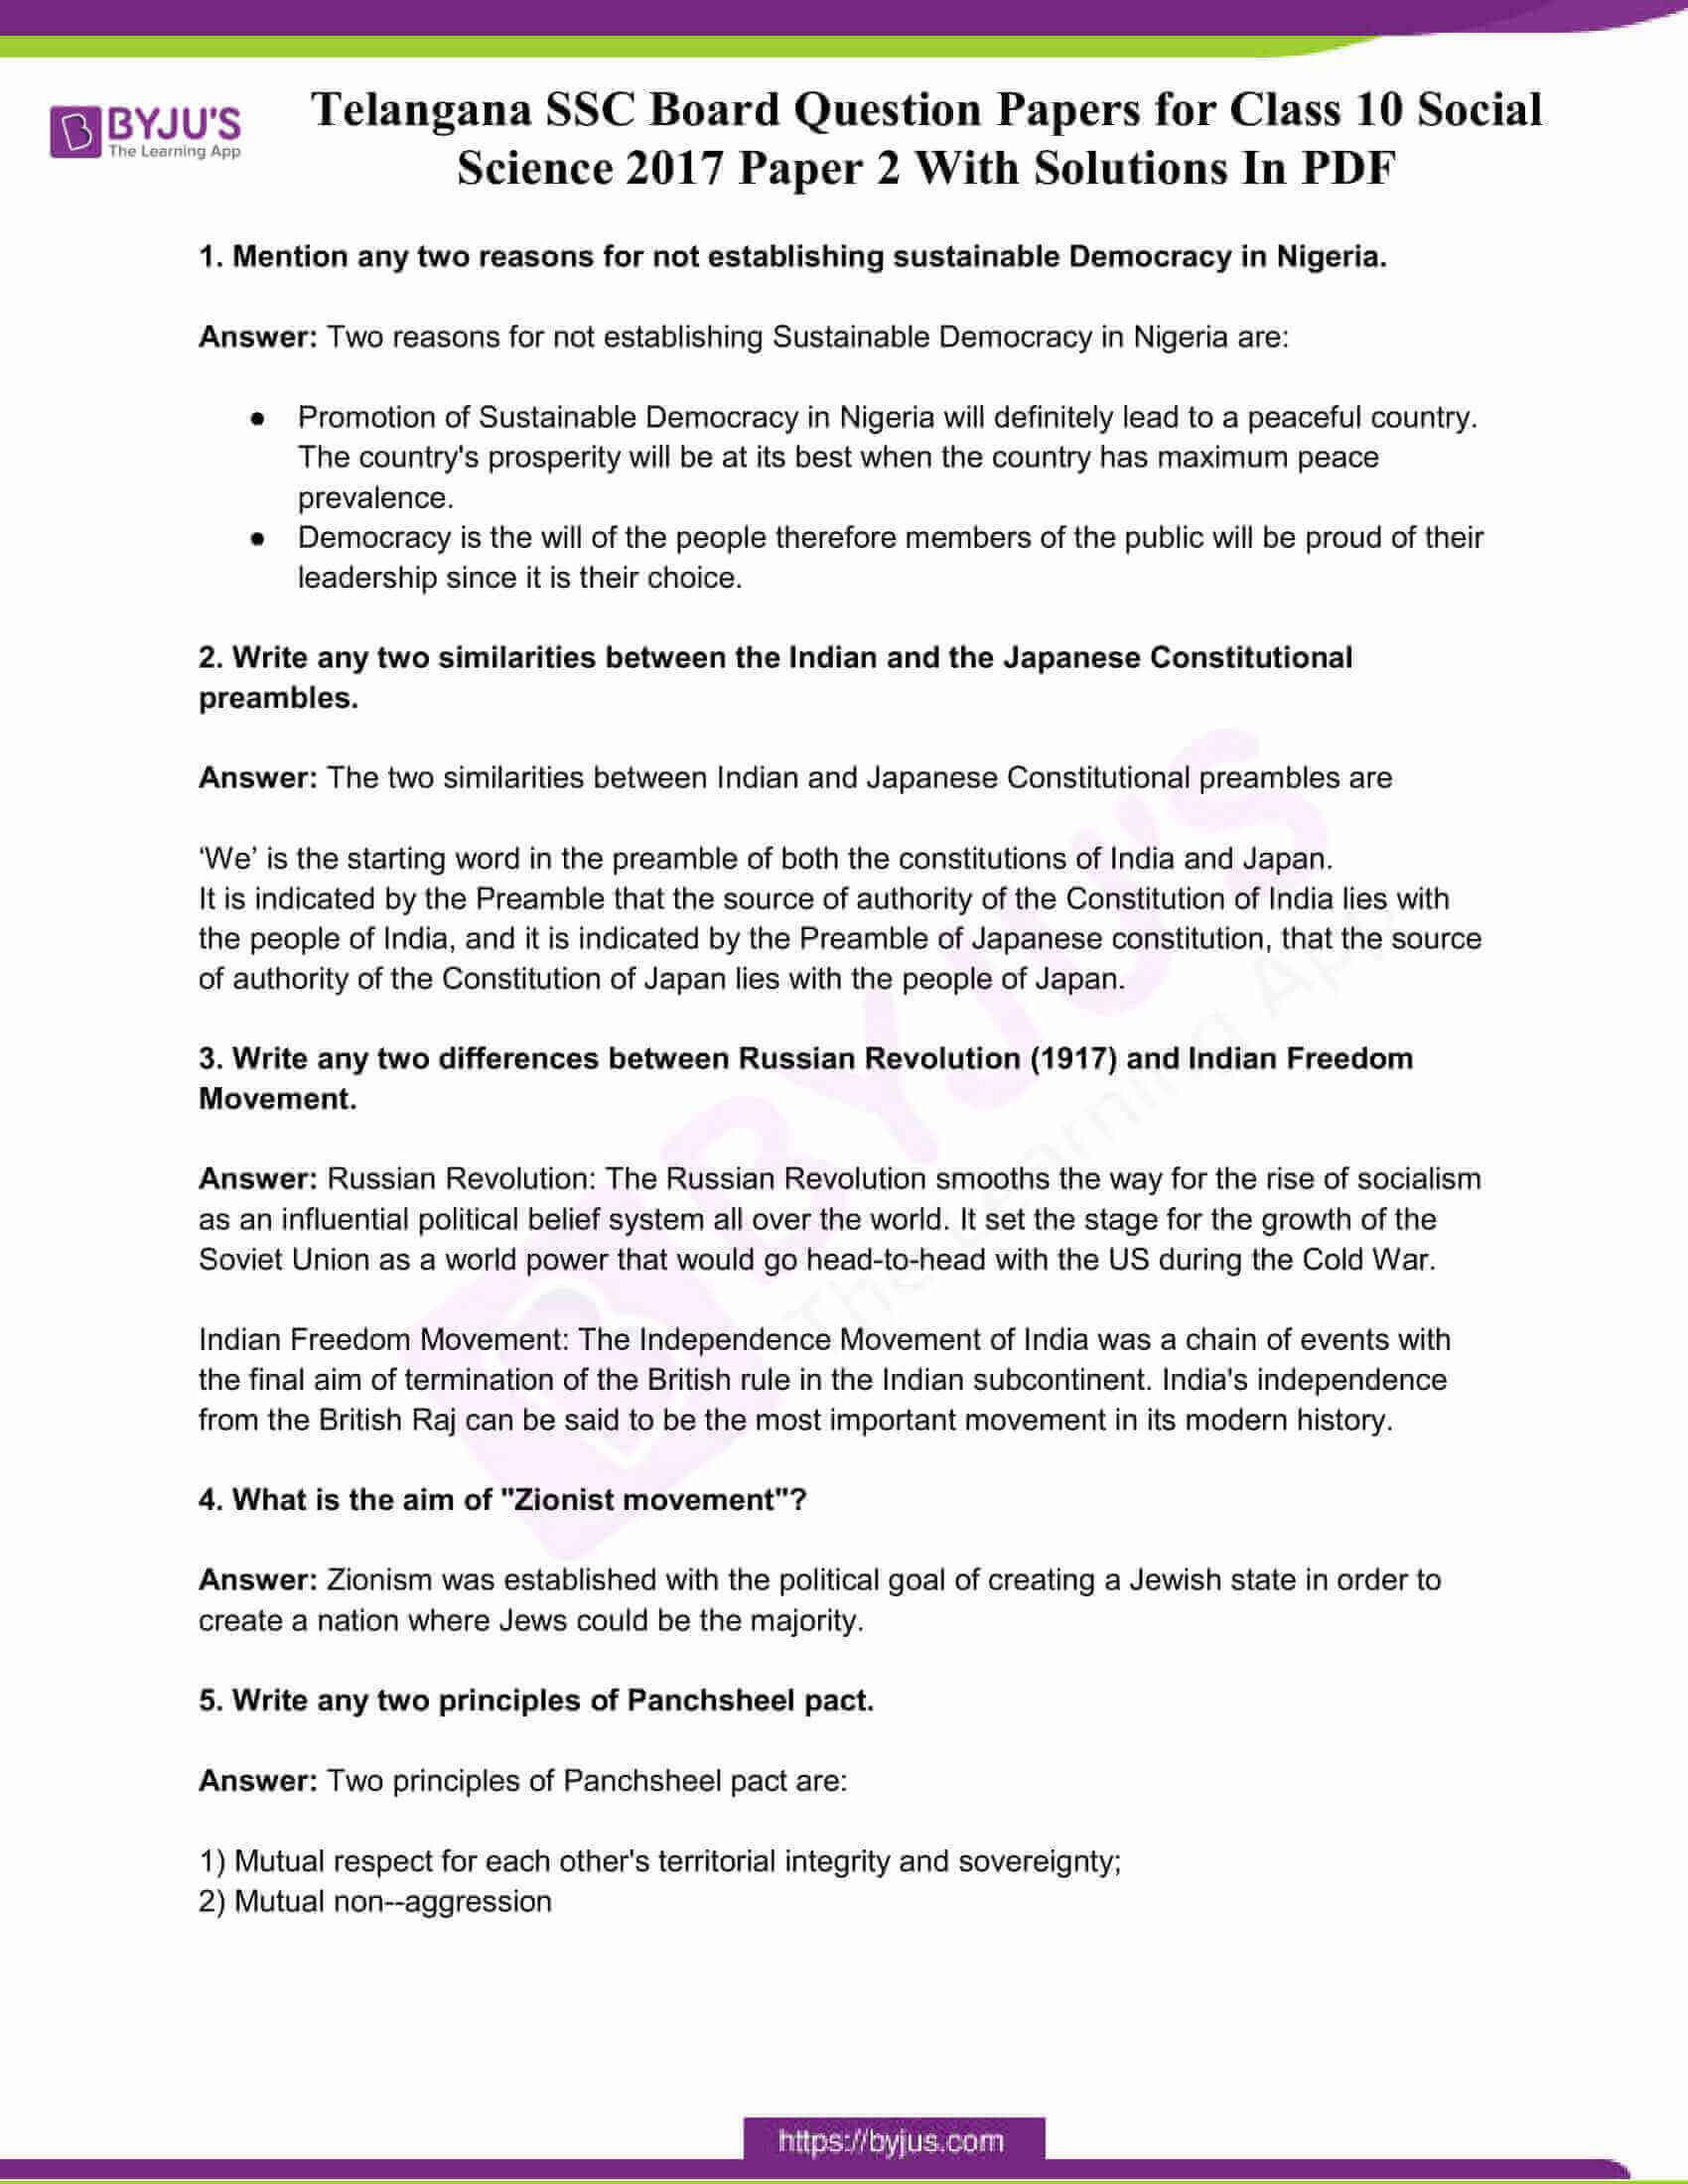 telangana board class 10 social science 2017 paper 2 solutions 1